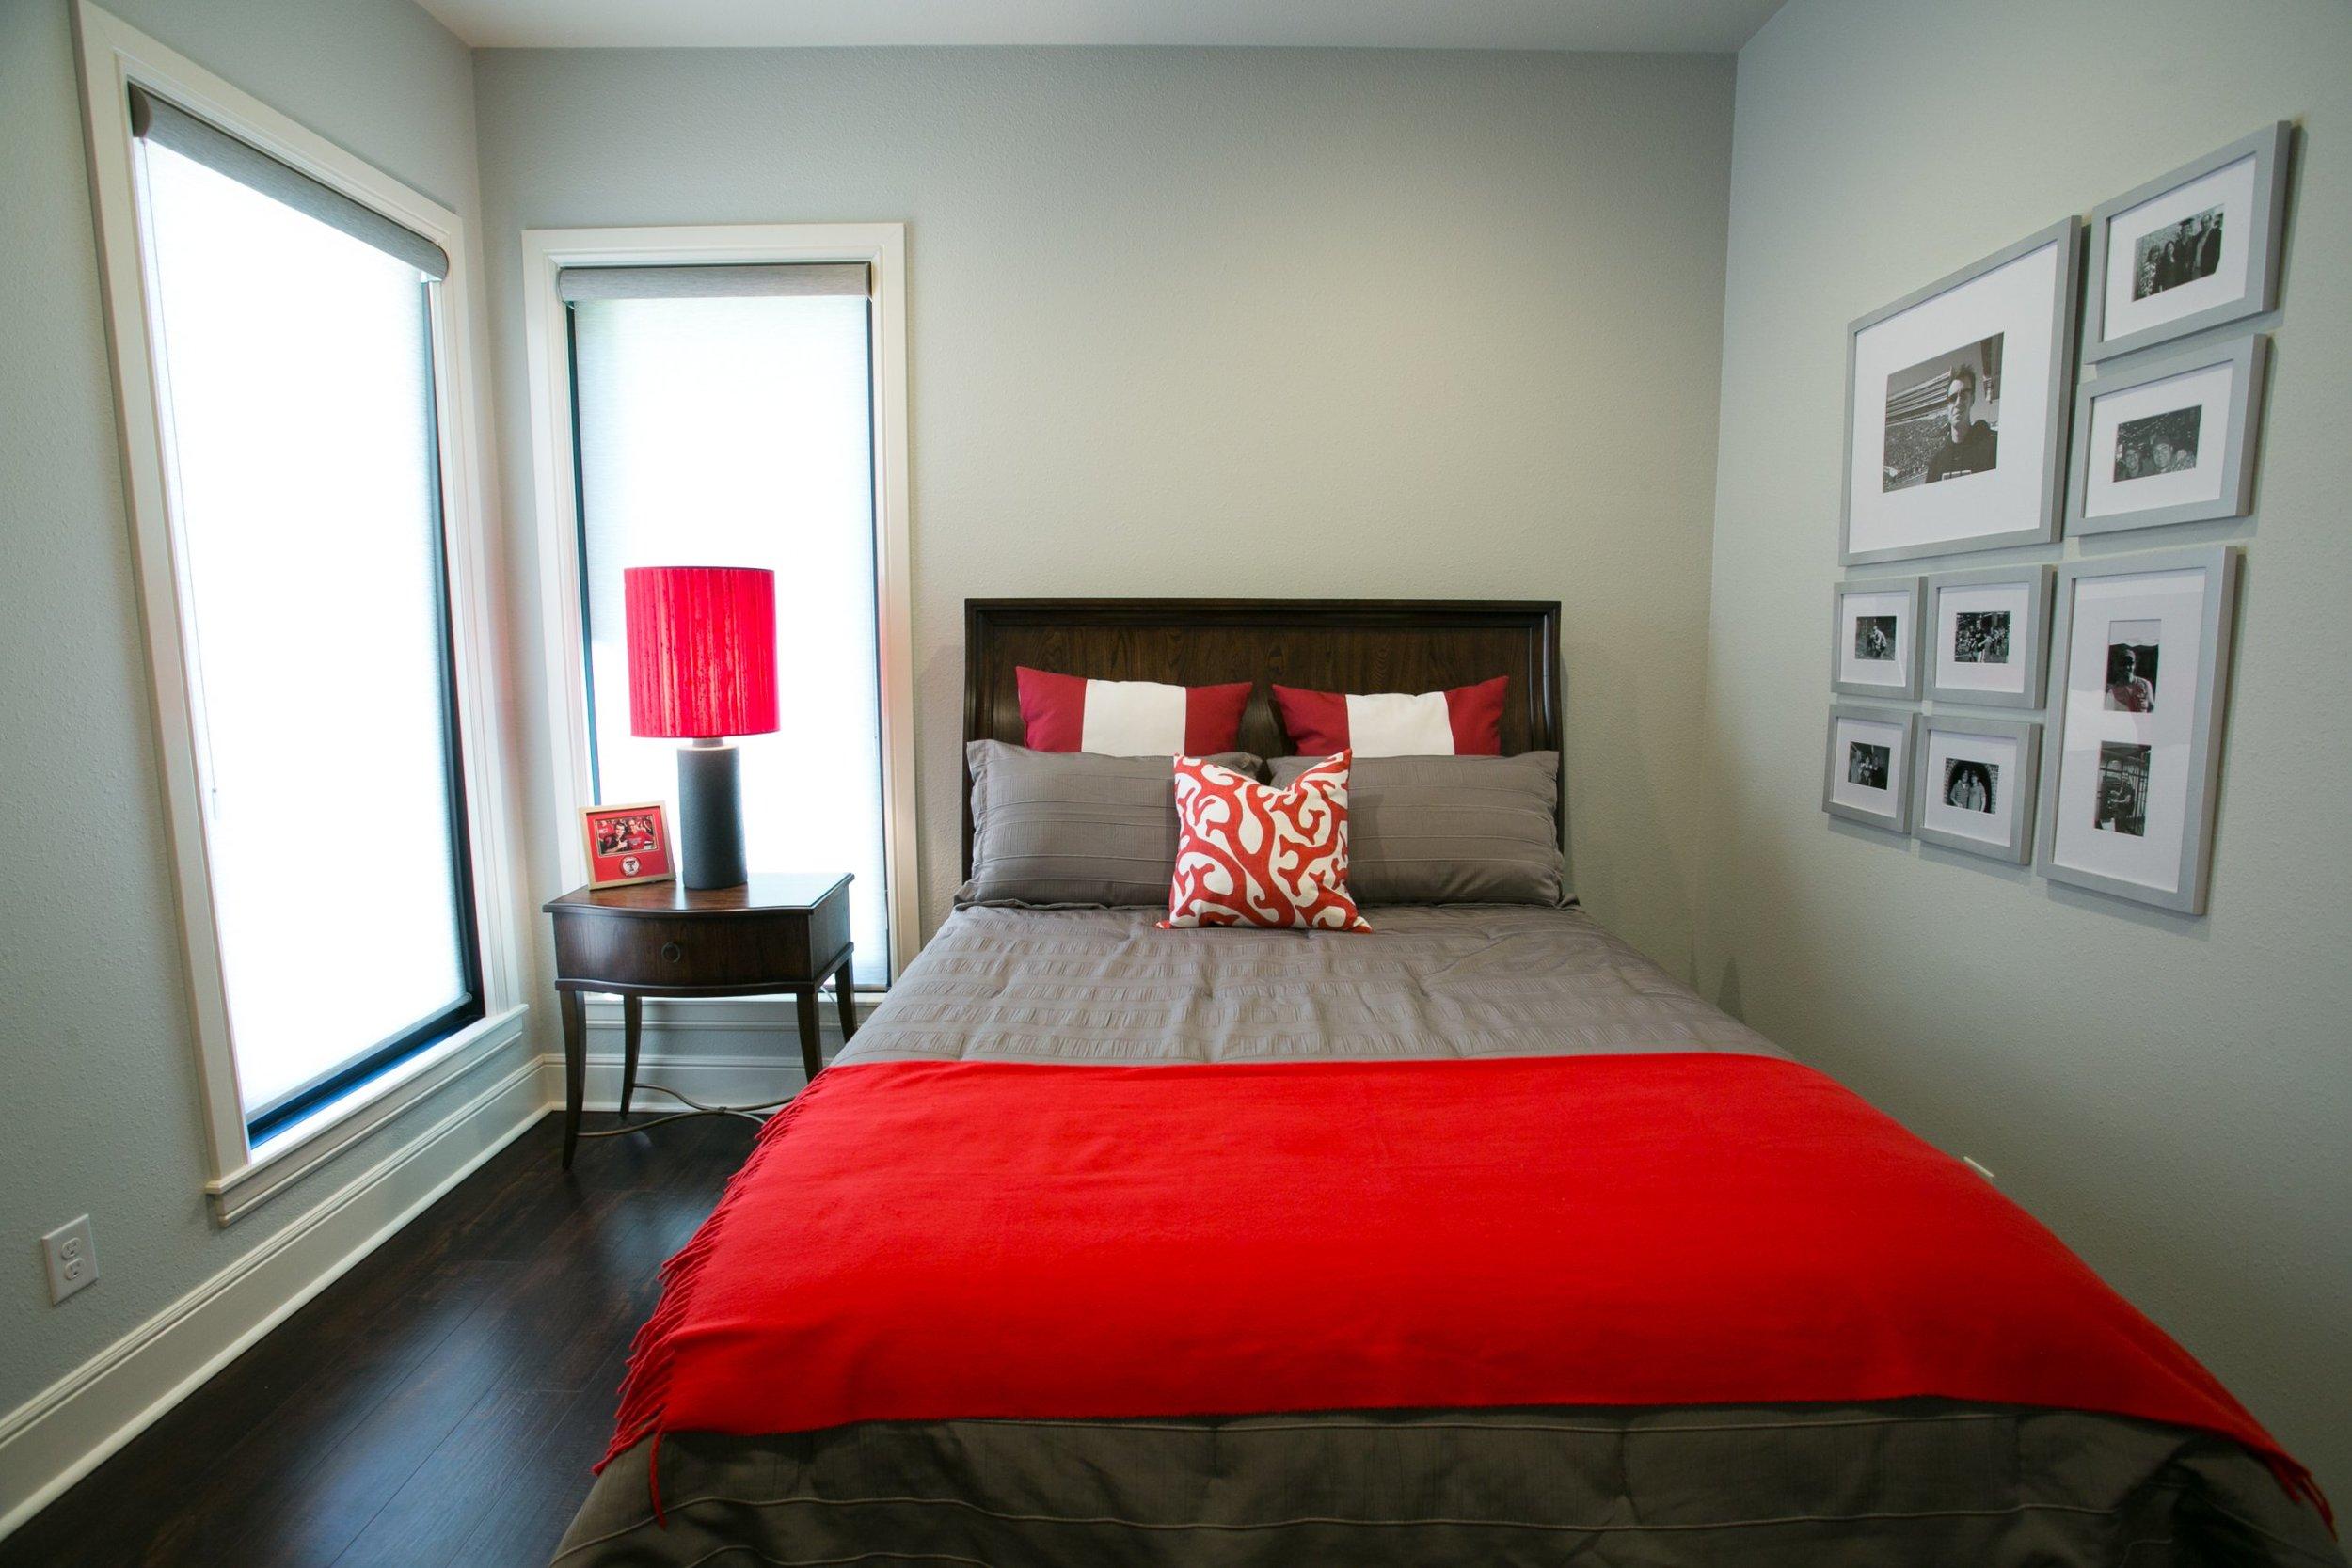 jillornelas.com/texas-tech-bedroom.jpg